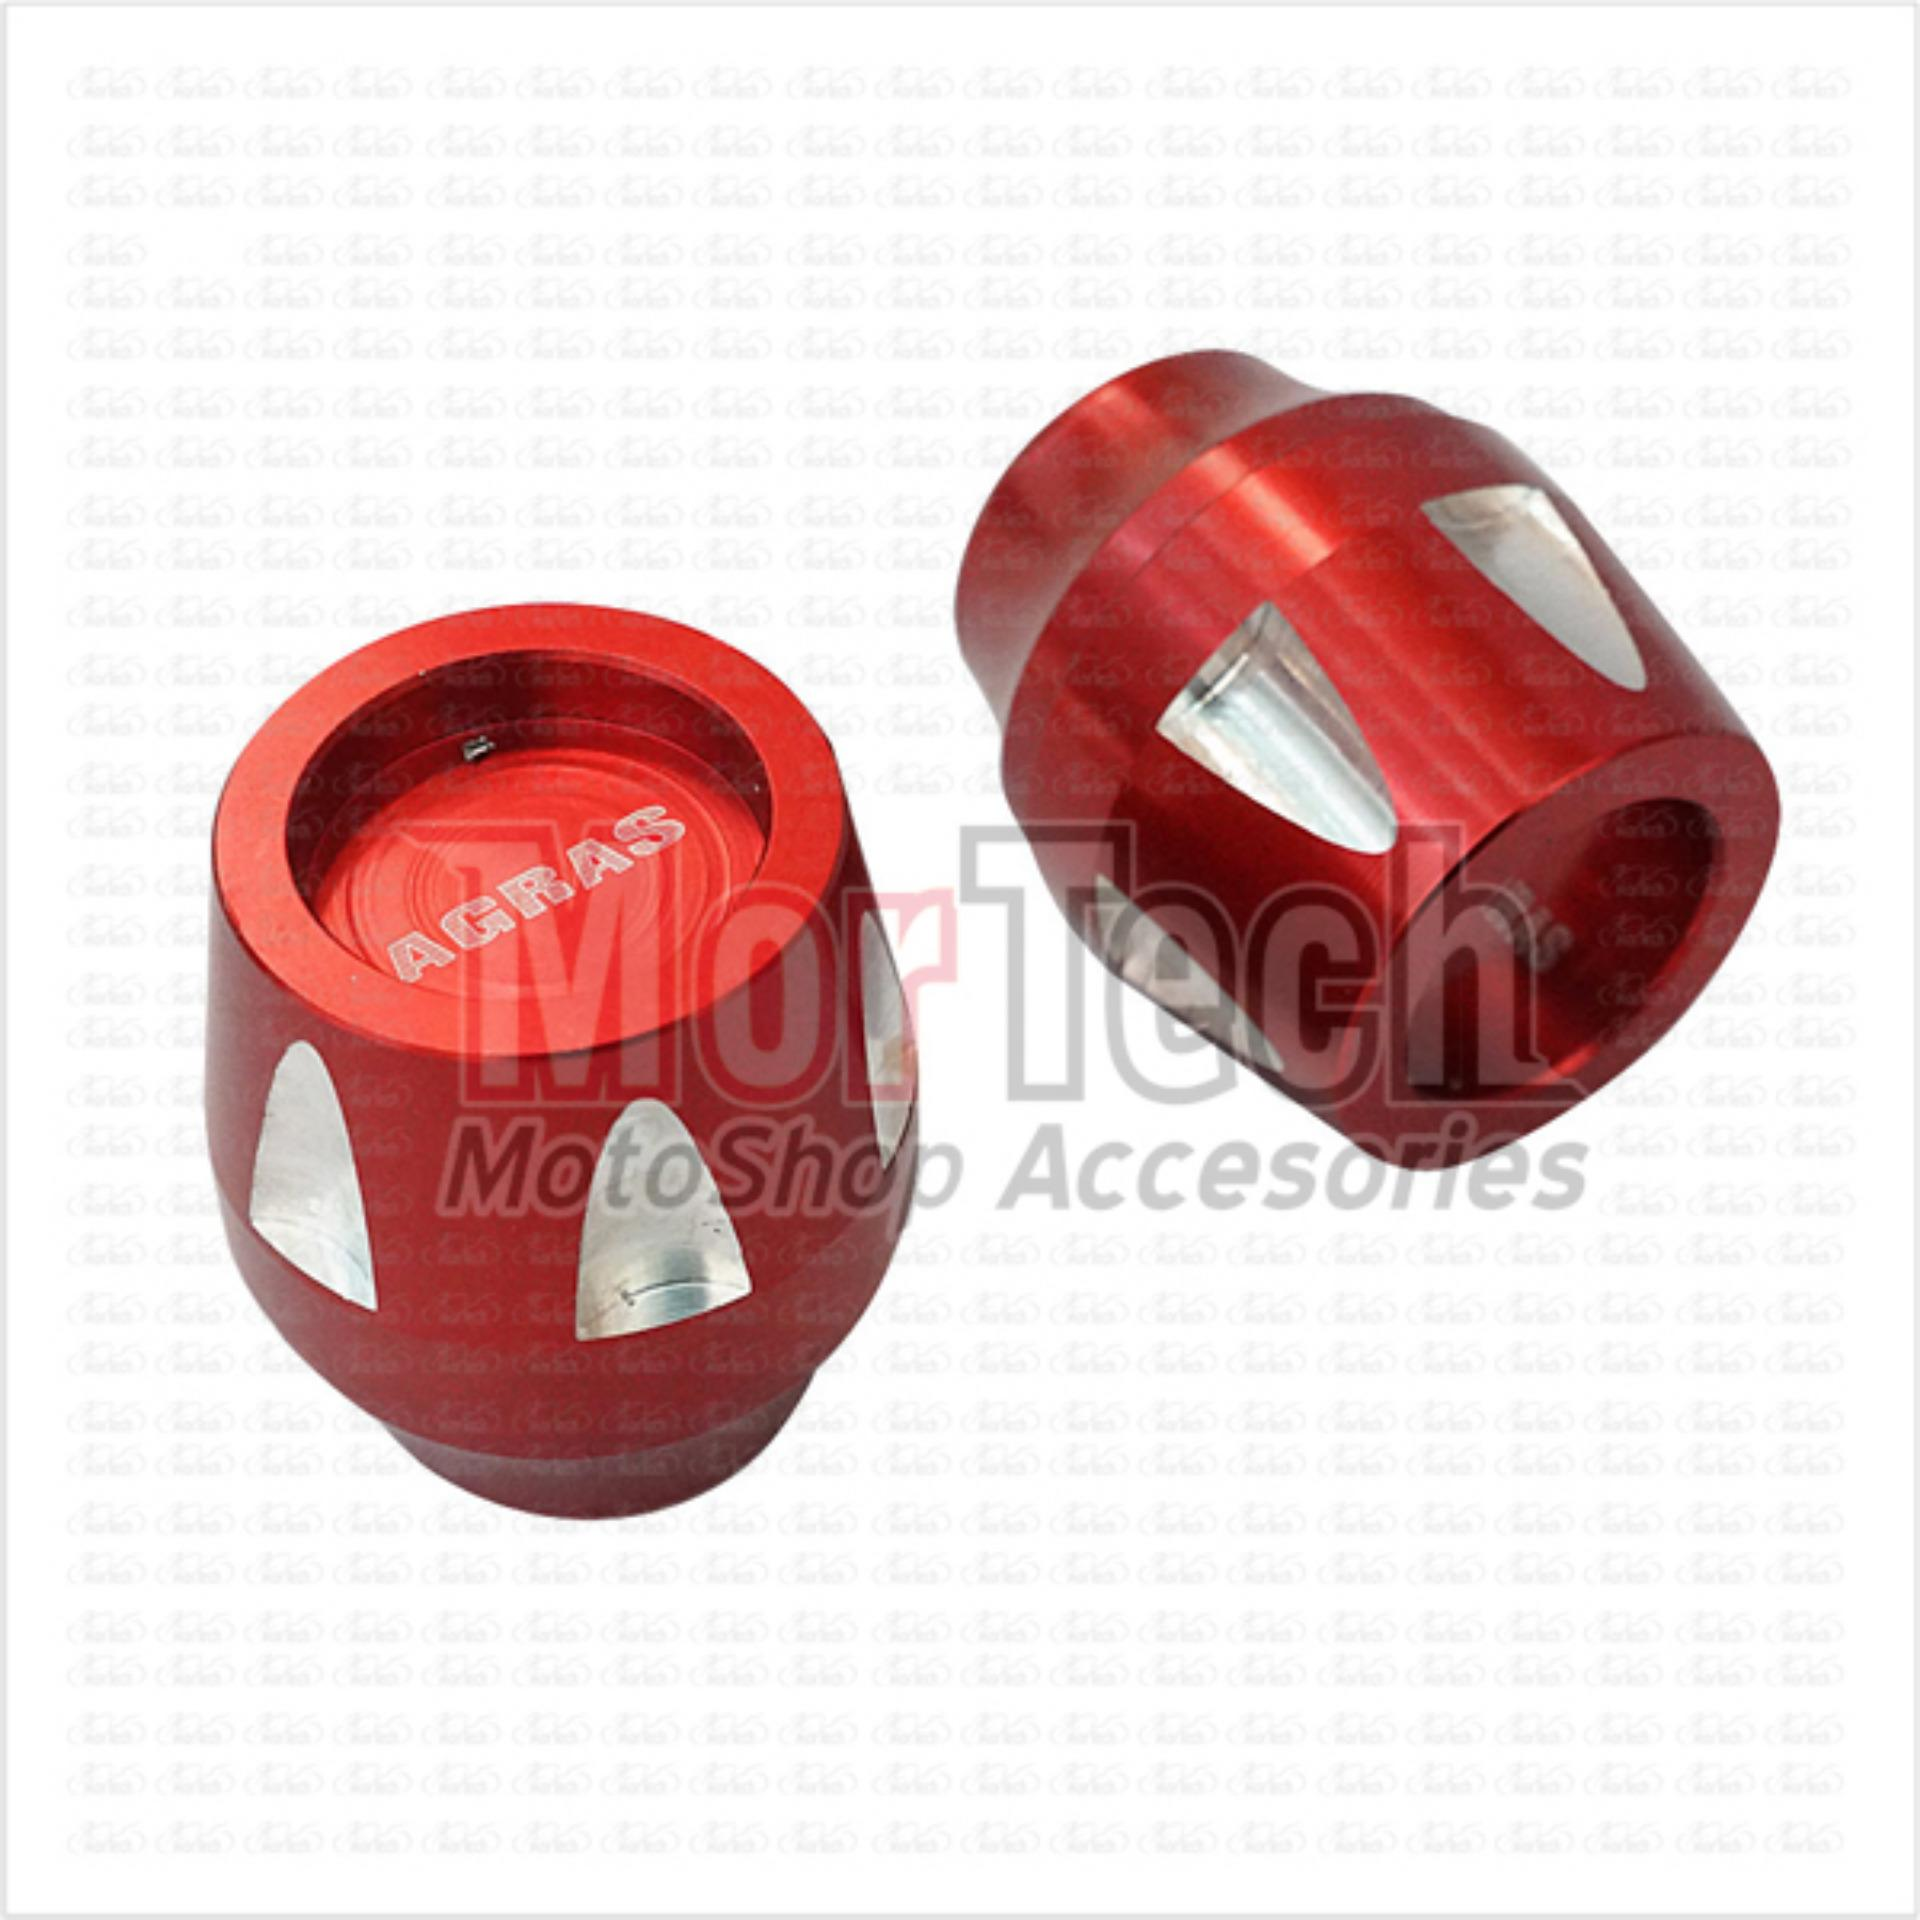 Cheap online Agras New Cover - Tutup - Jalu - Bandul as roda Depan CNC CBR 150Merah